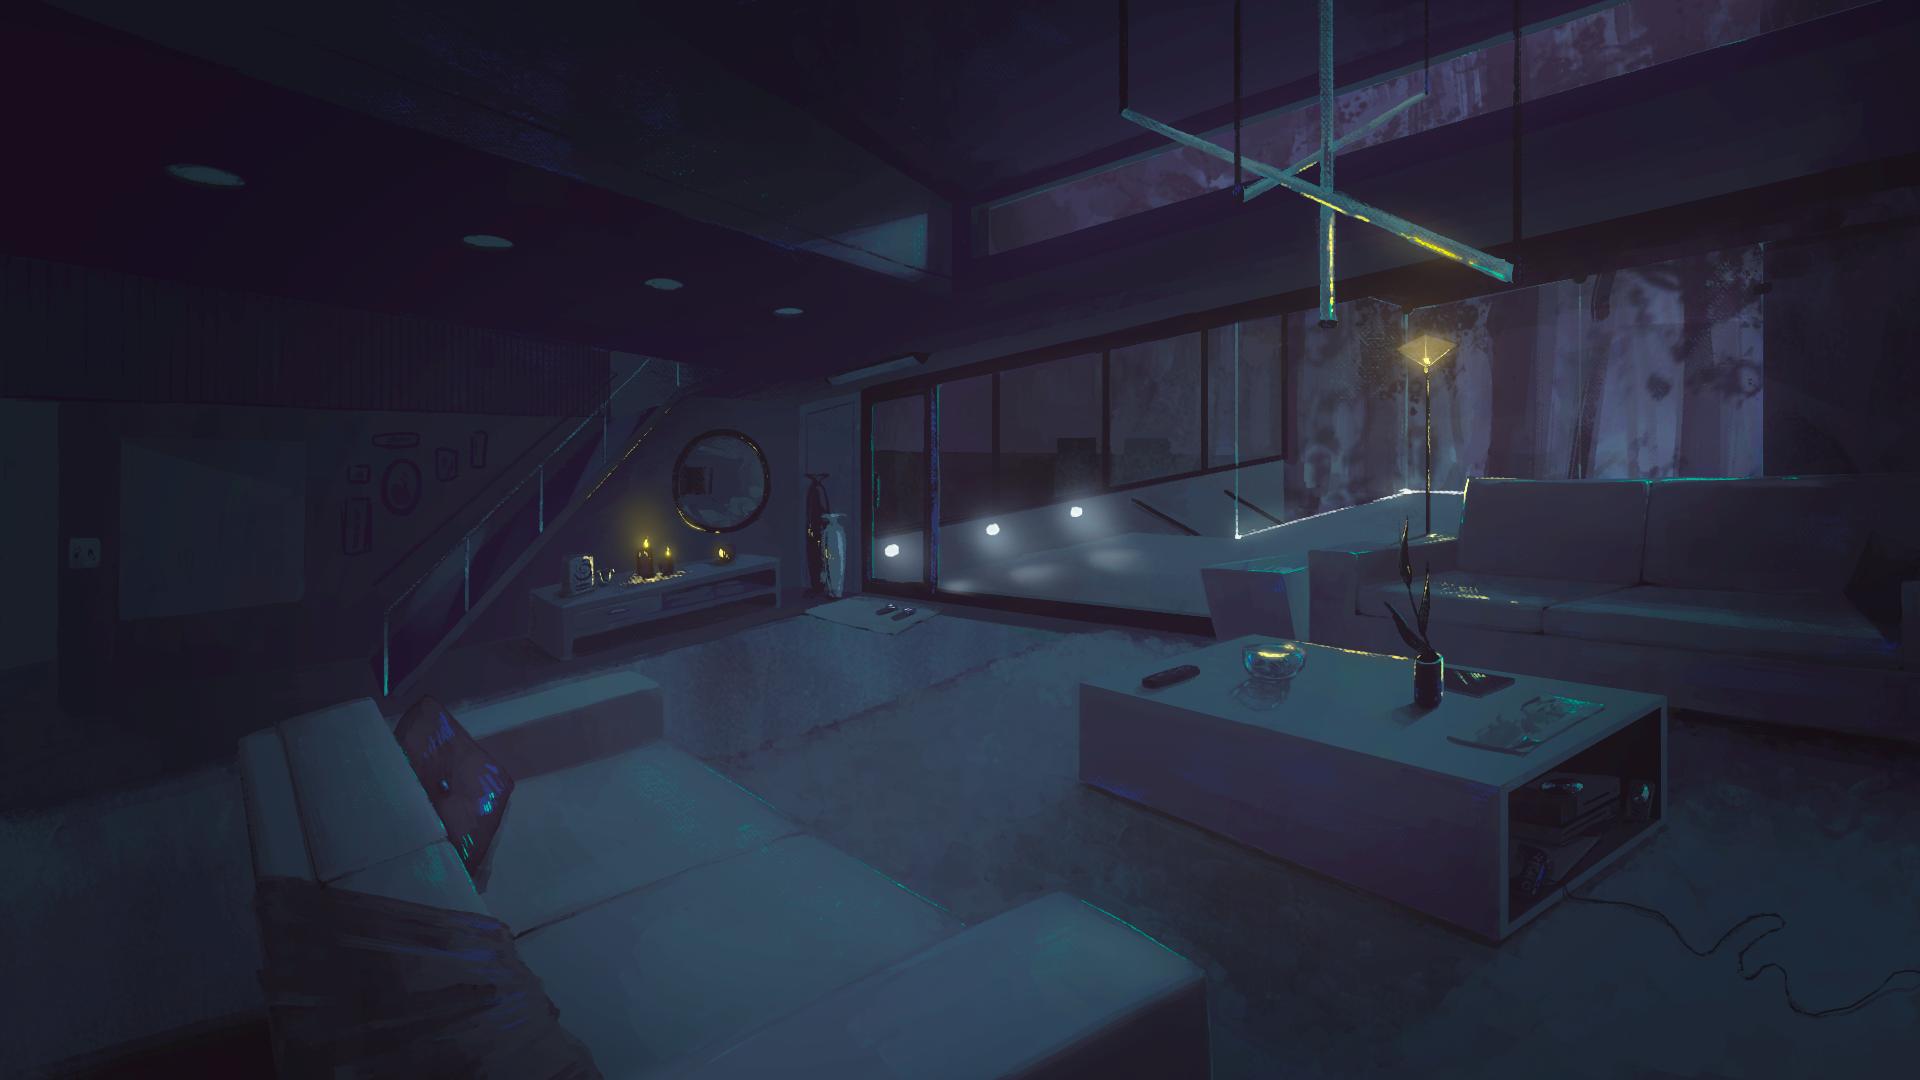 Grover Interior 01 | B. Chau